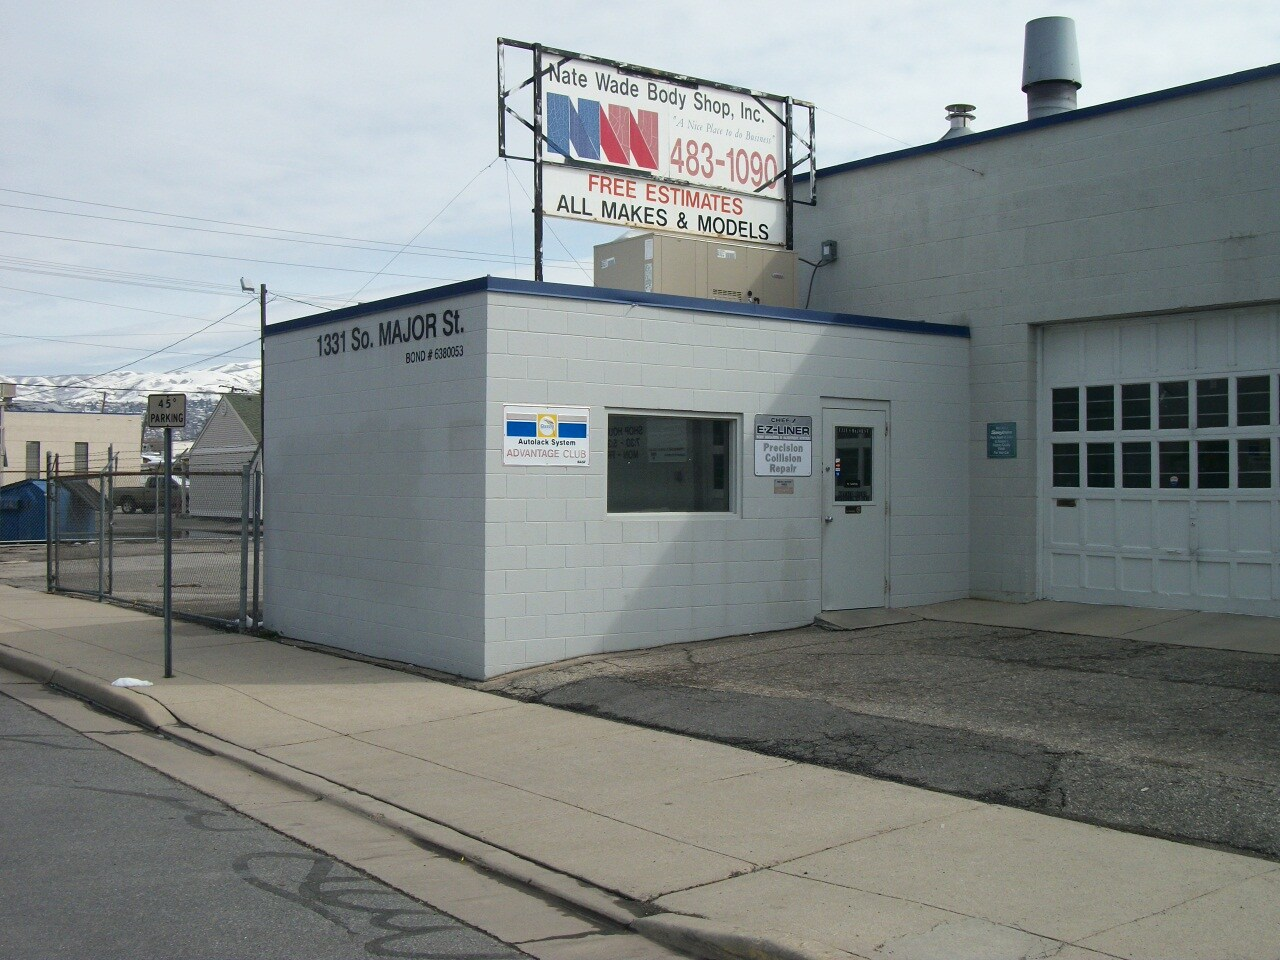 Body Shop Collision Repair Shop In Salt Lake City Free Estimates